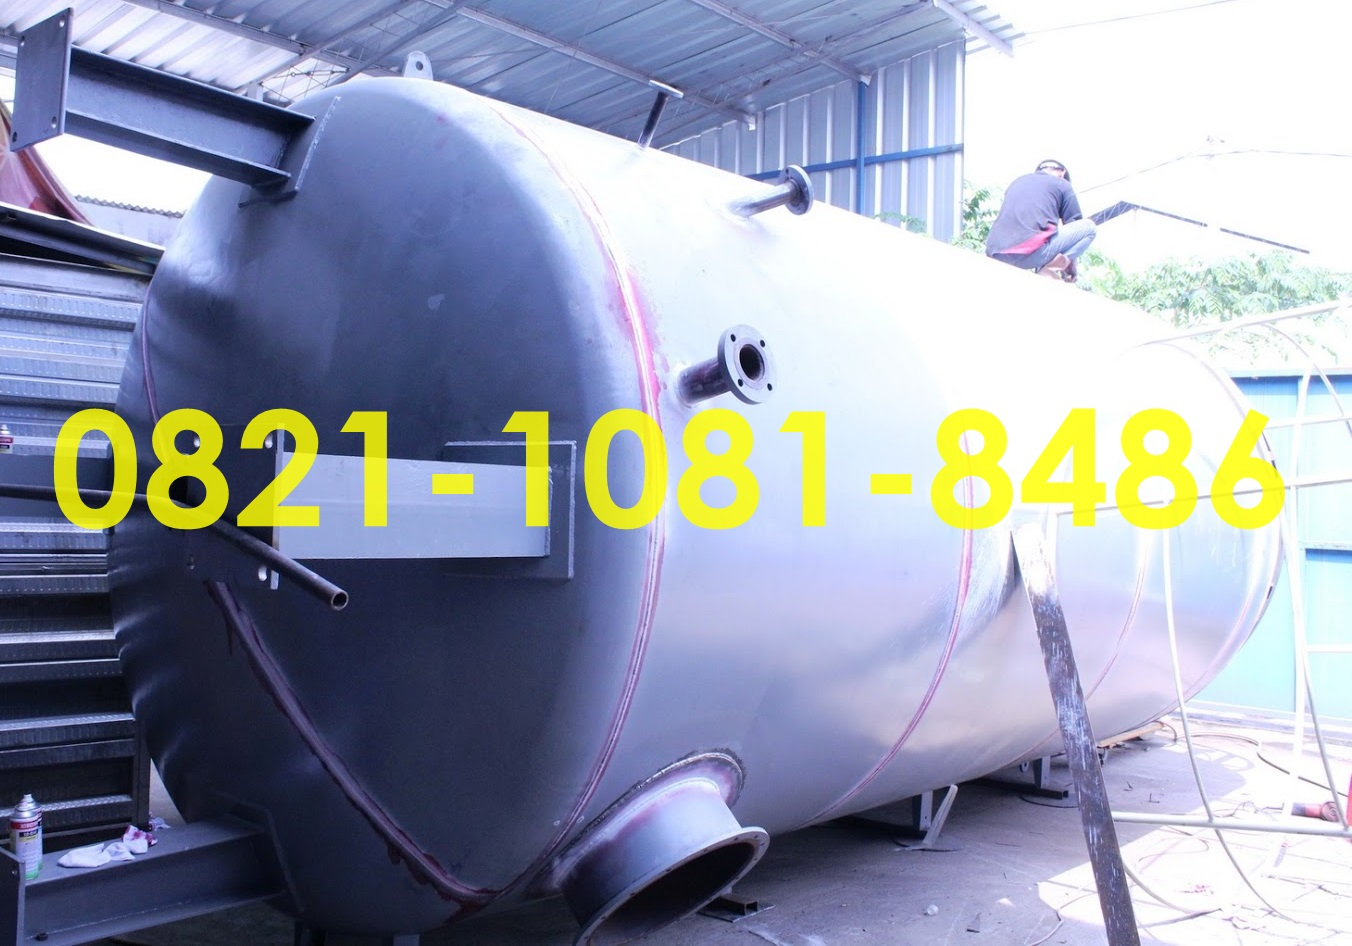 Jasa Fabrikasi Storage Tank Di Indonesia Roll New Supra X 125 Fi Cast Wheel Energetic Red Kota Semarang